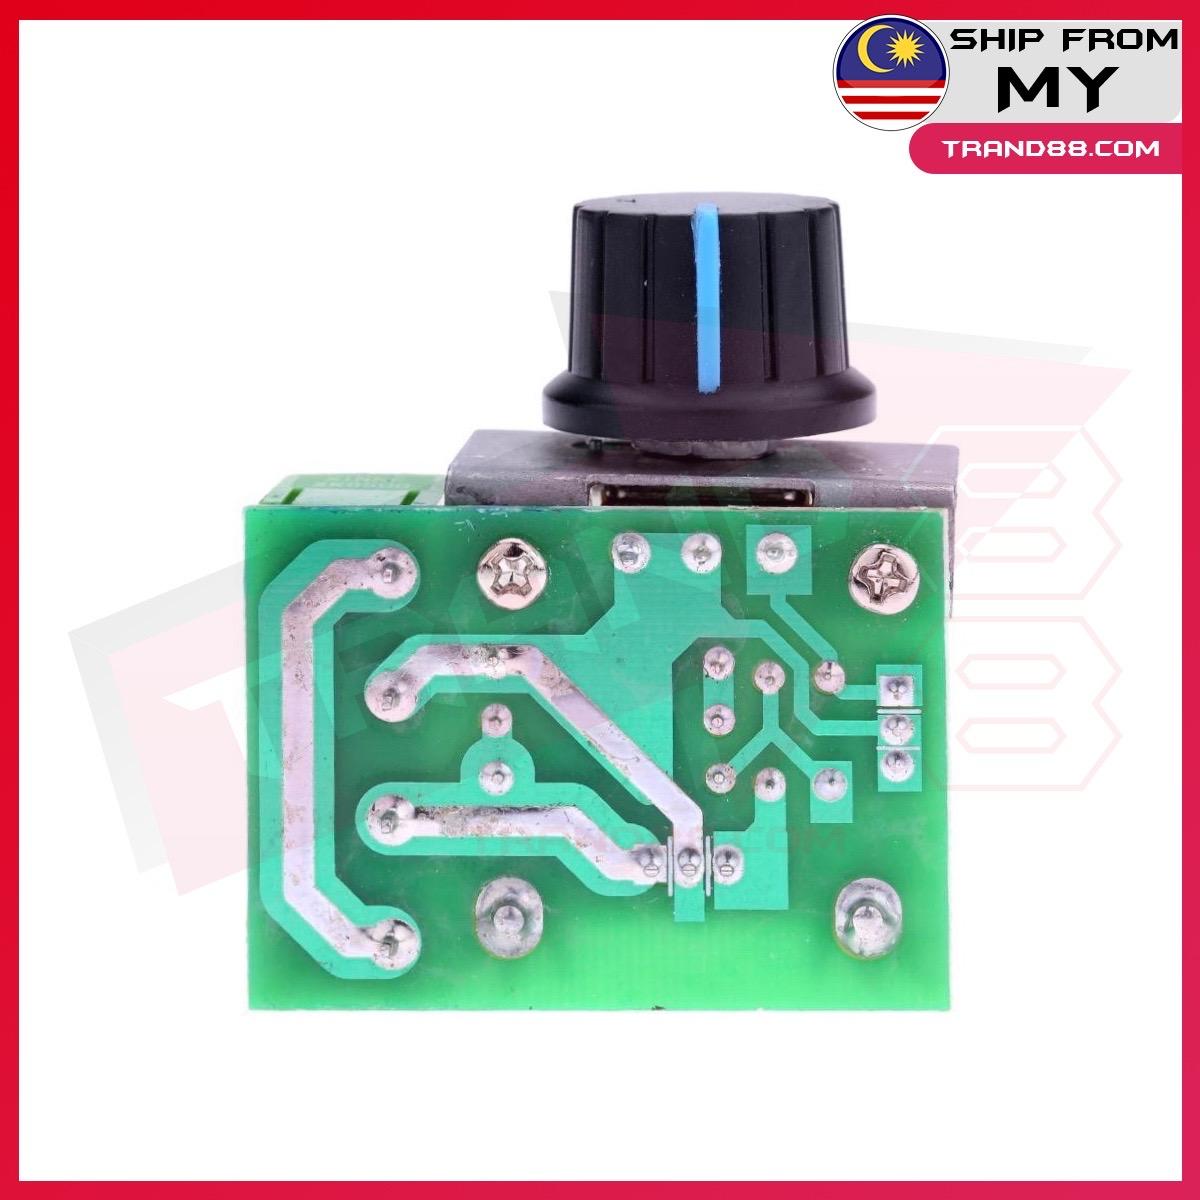 AC 220V 2000W SCR Voltage Regulator Dimming Dimmers Motor Speed Controller Thermostat Electronic Voltage Regulator